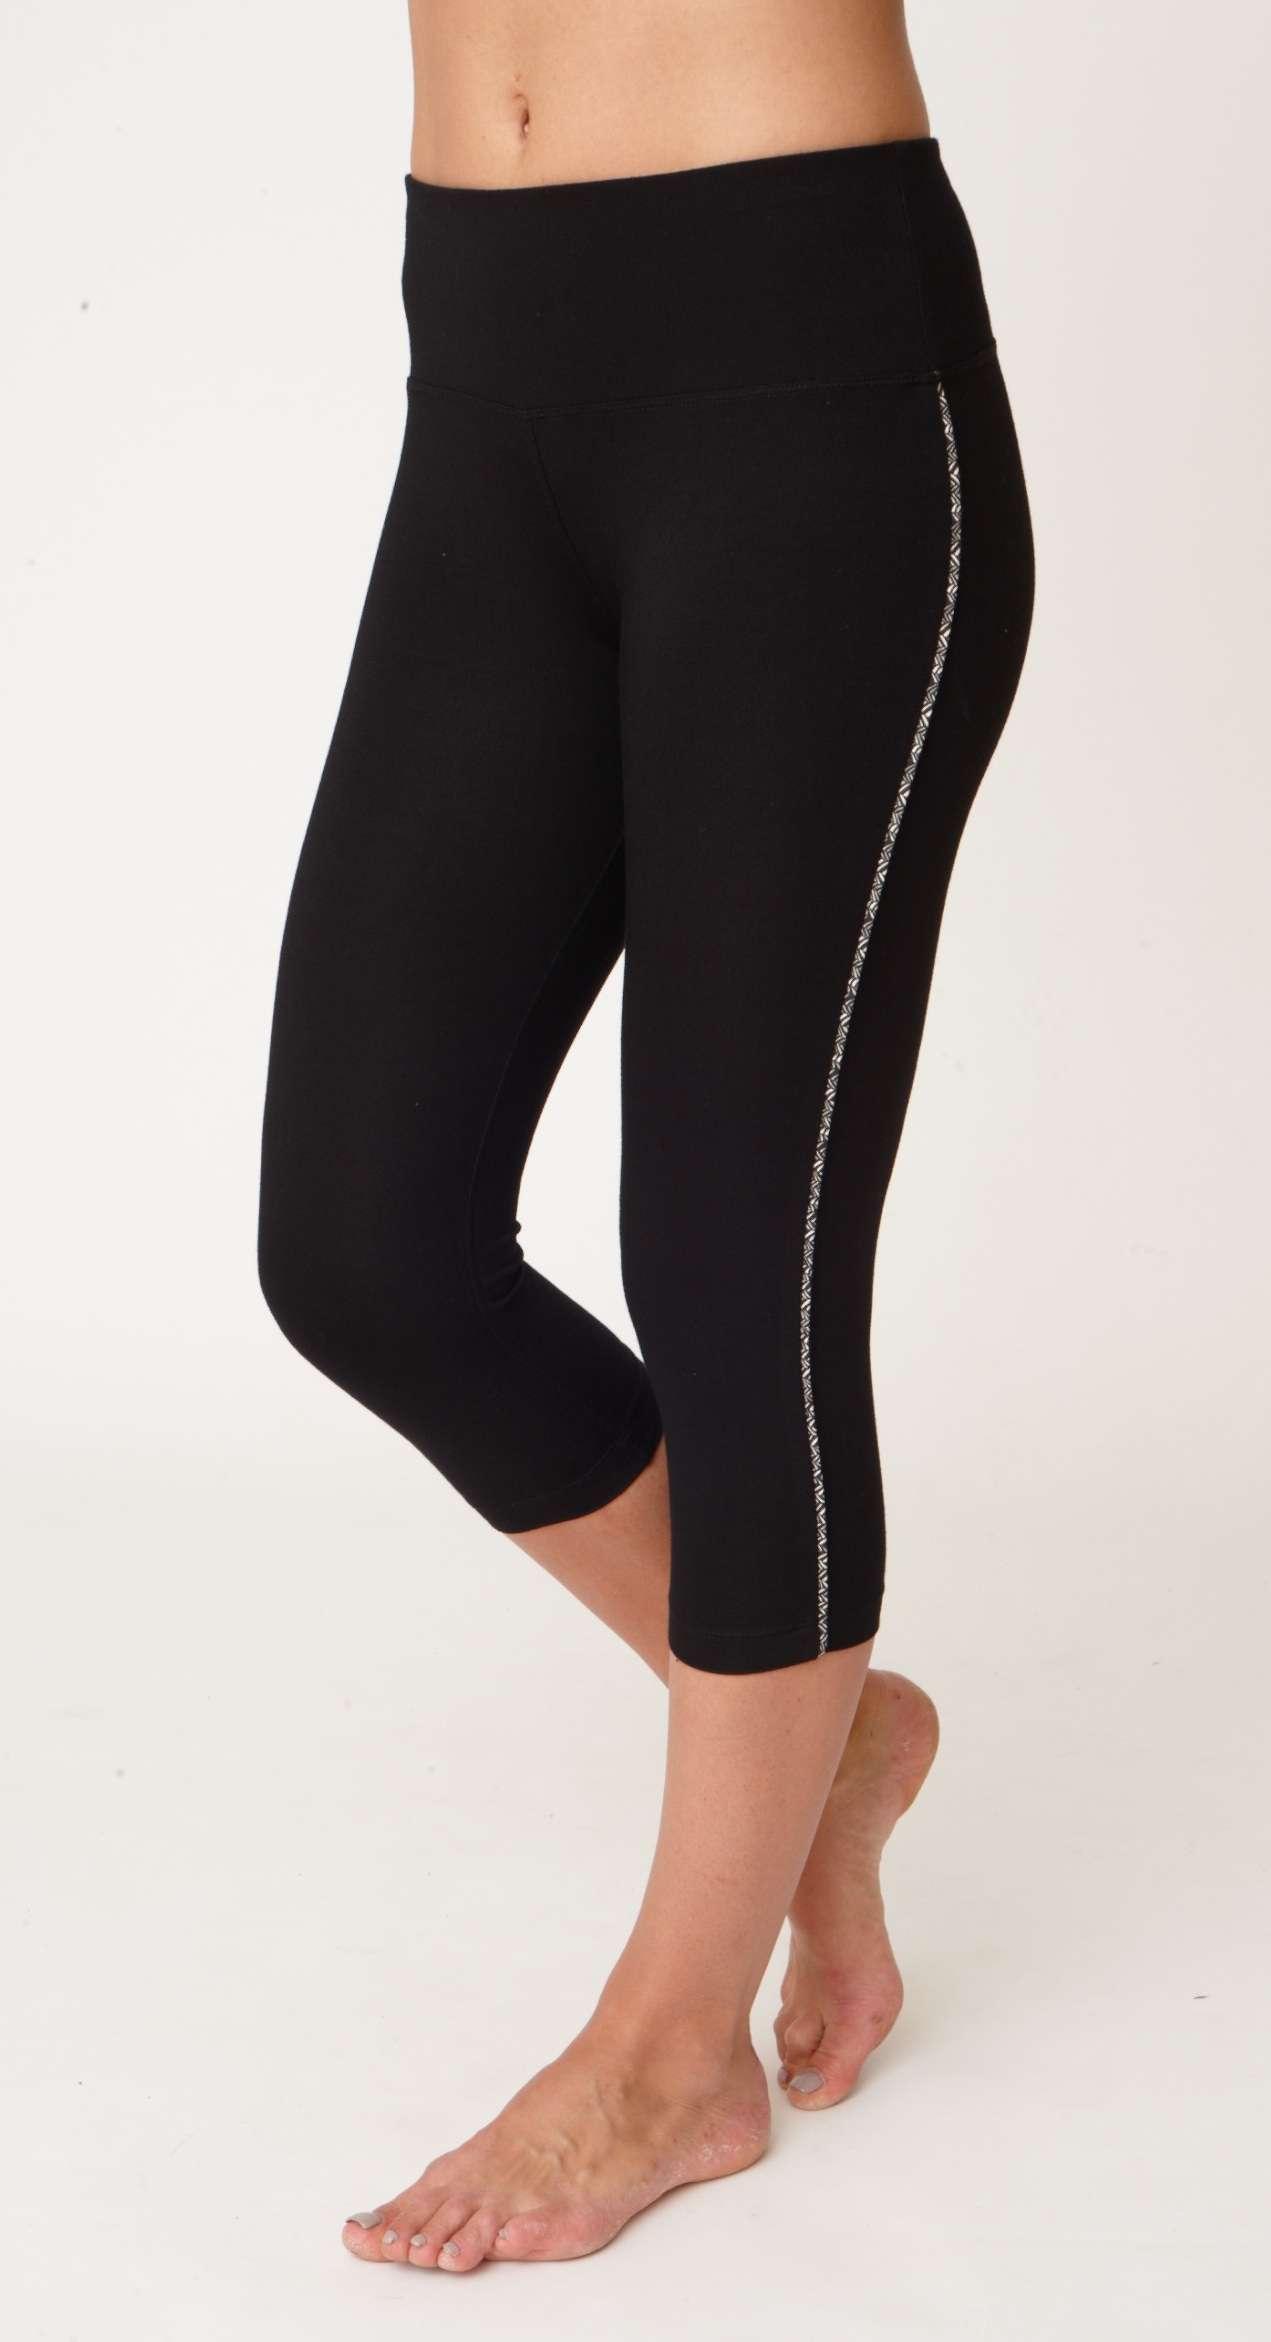 Asquith Karma Capri Yoga Leggings Jet Black with Herringbone Stripe